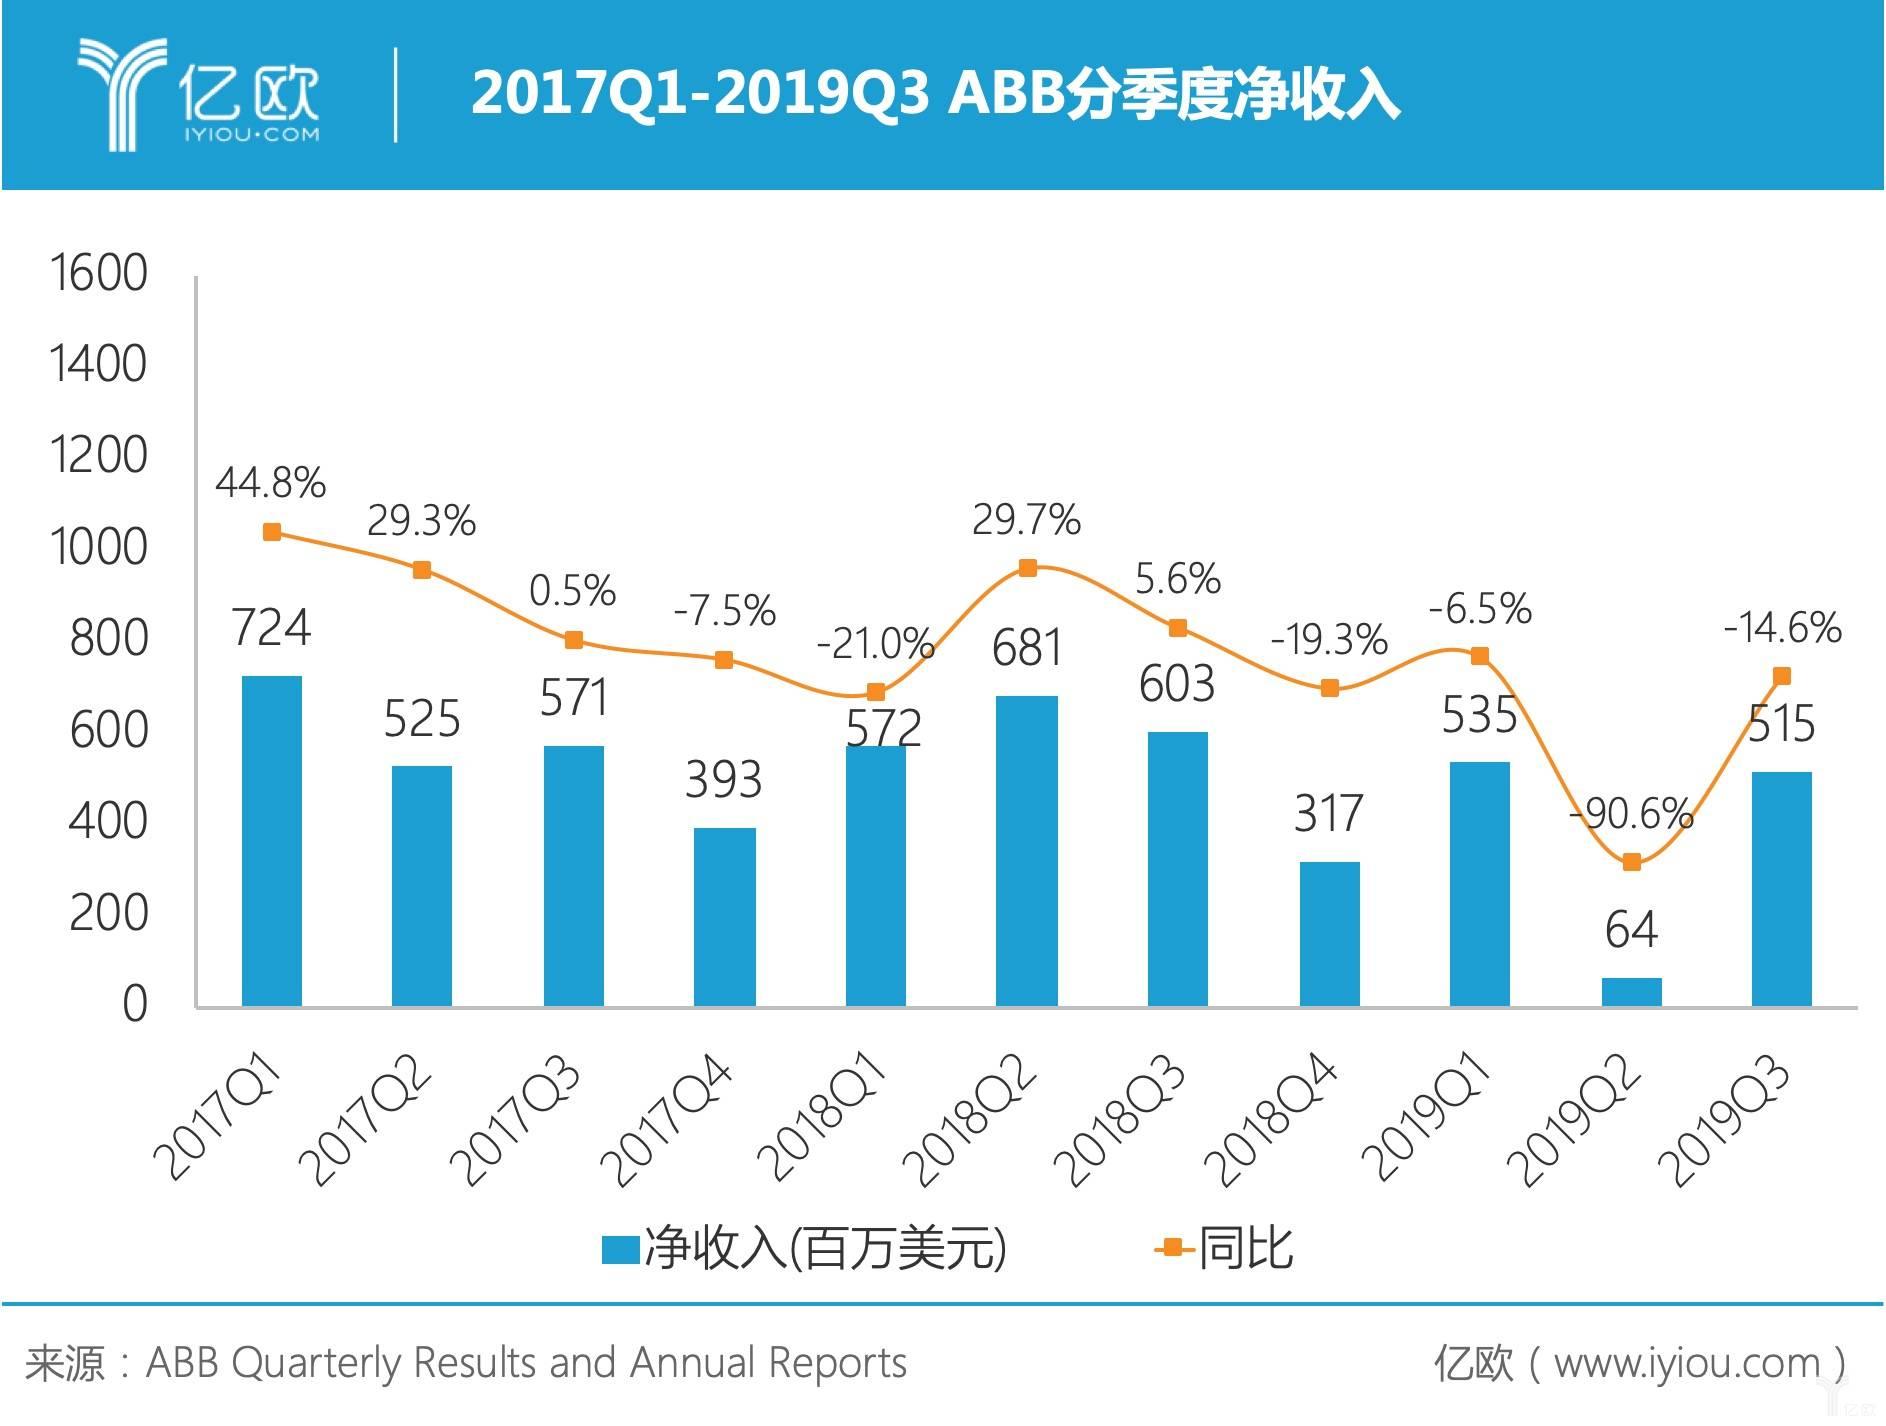 2017Q1-2019Q3 ABB分季度净收入